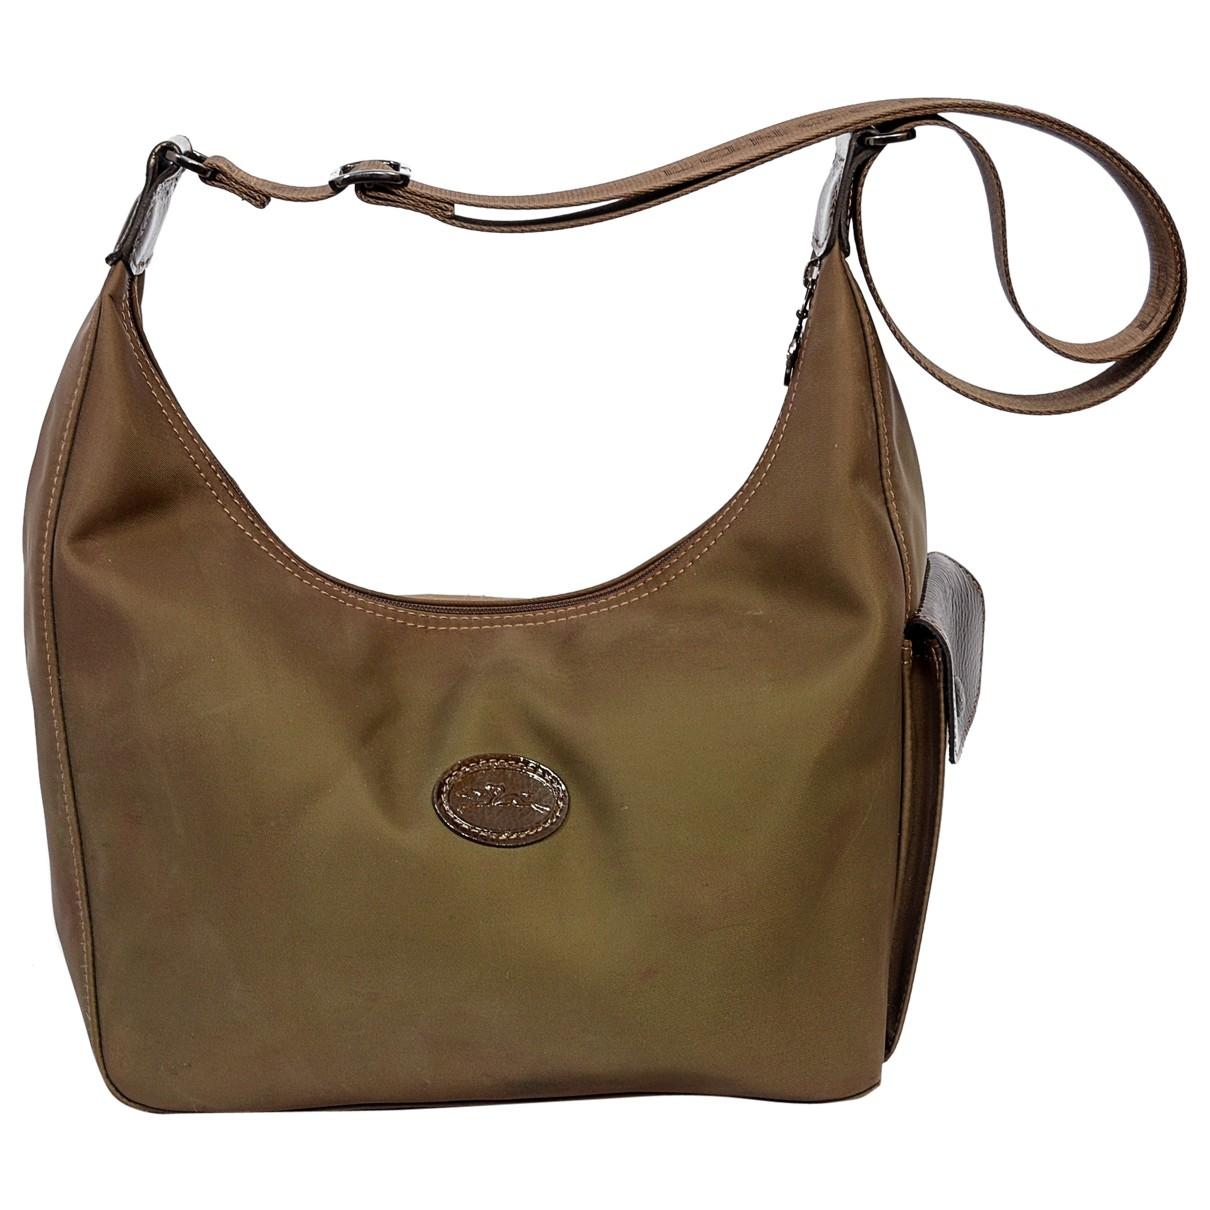 Longchamp \N Brown handbag for Women \N